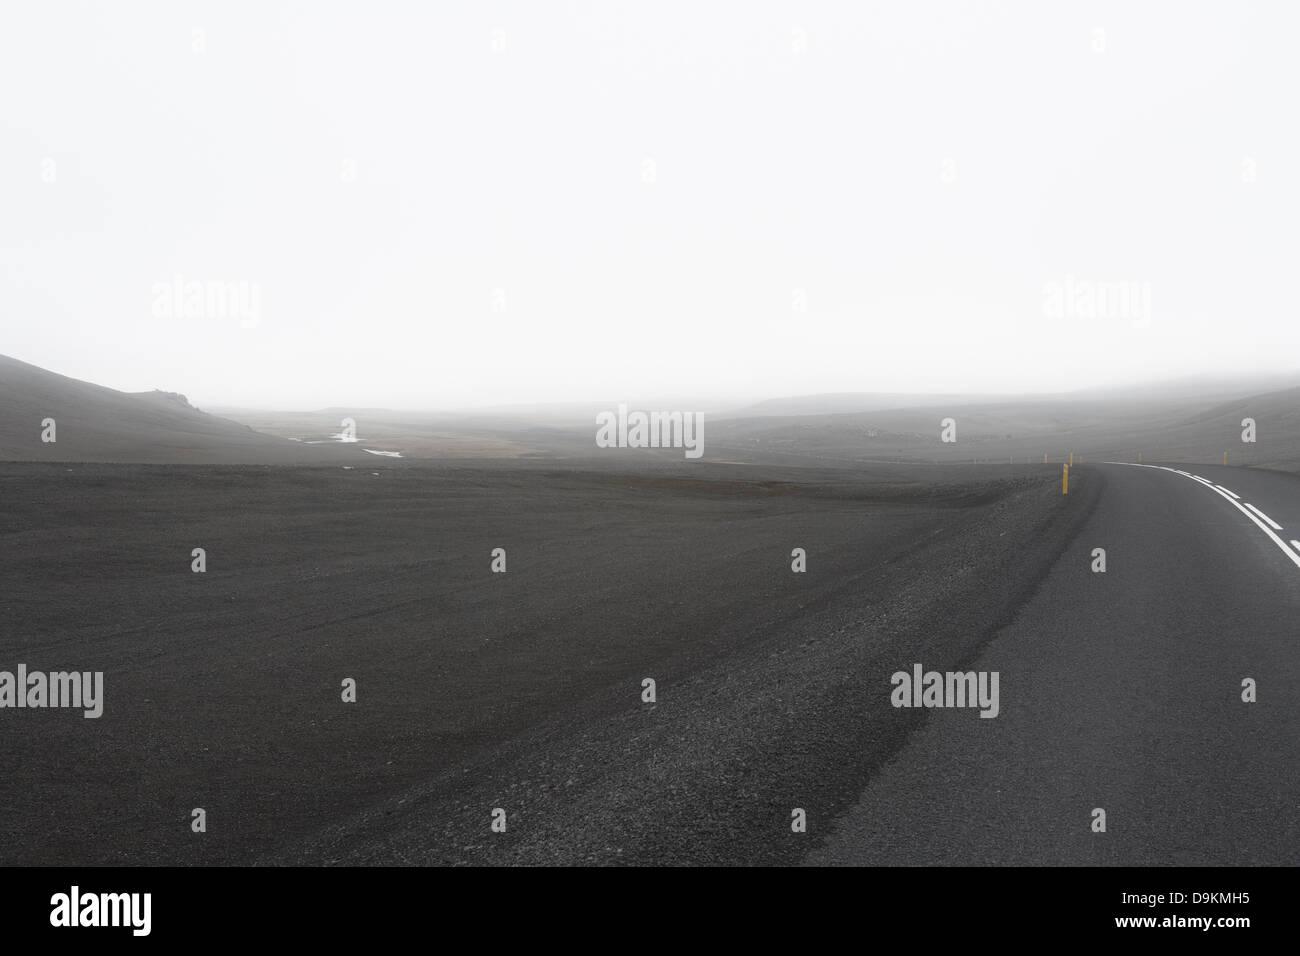 Grey road in empty landscape - Stock Image